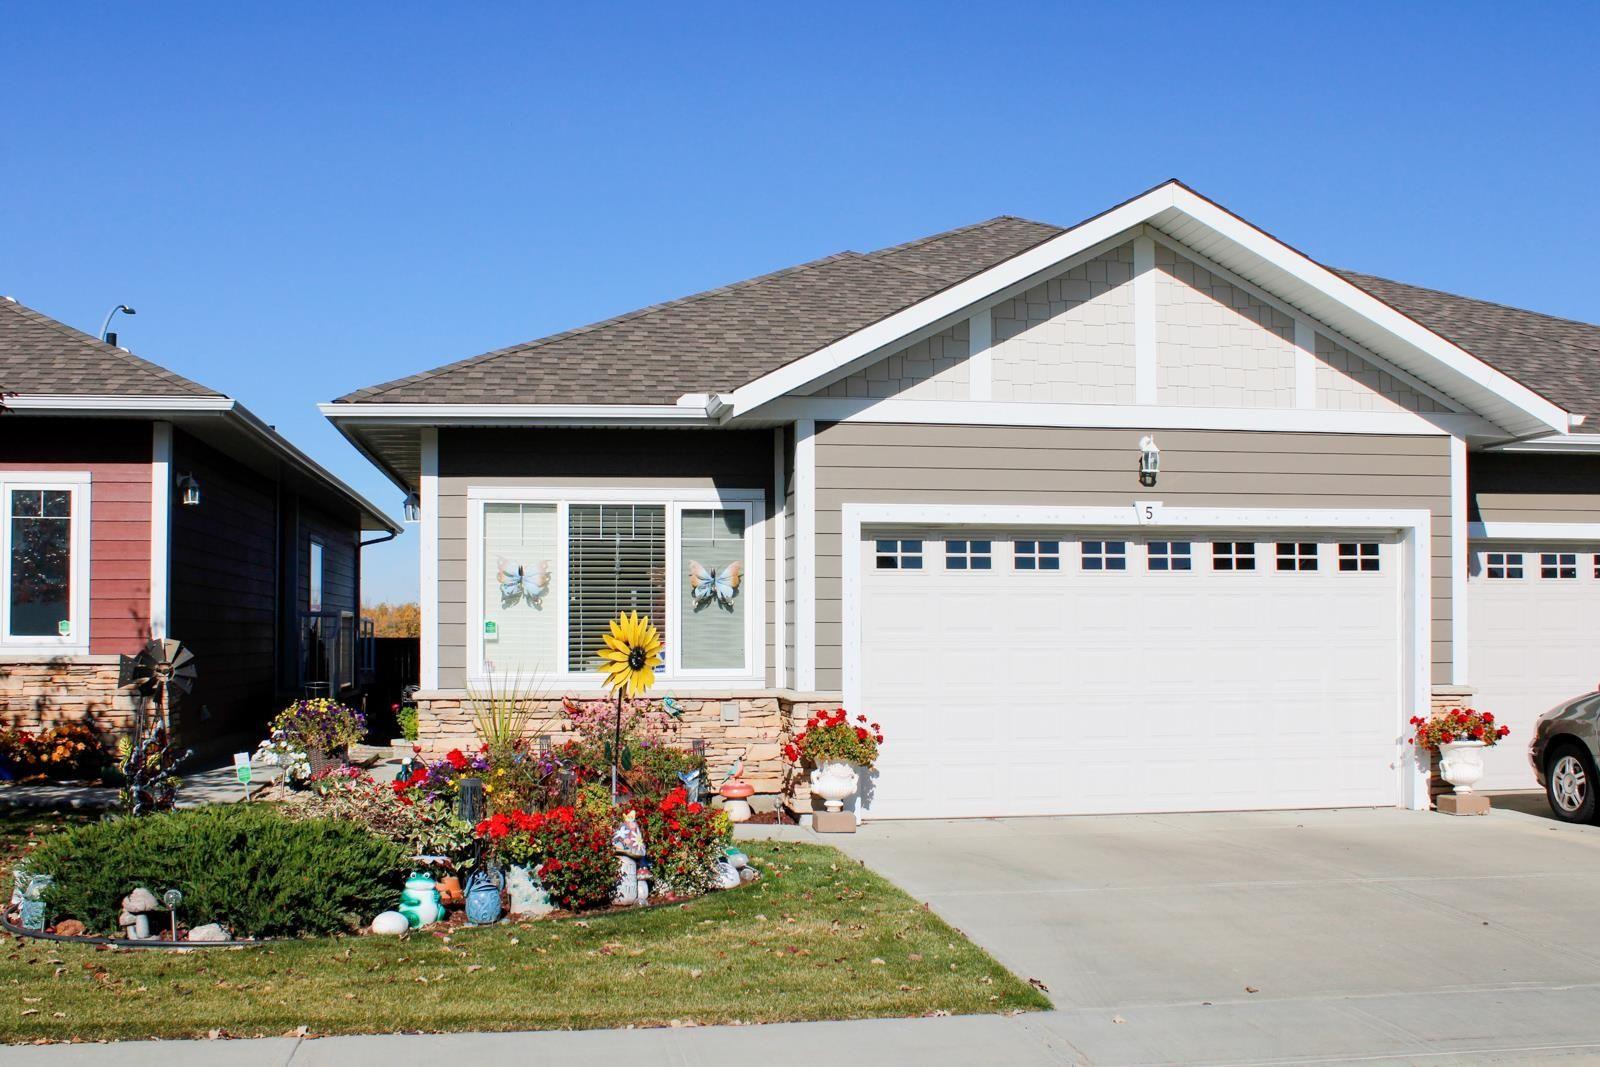 Main Photo: 5 175 MCCONACHIE Drive in Edmonton: Zone 03 House Half Duplex for sale : MLS®# E4266416